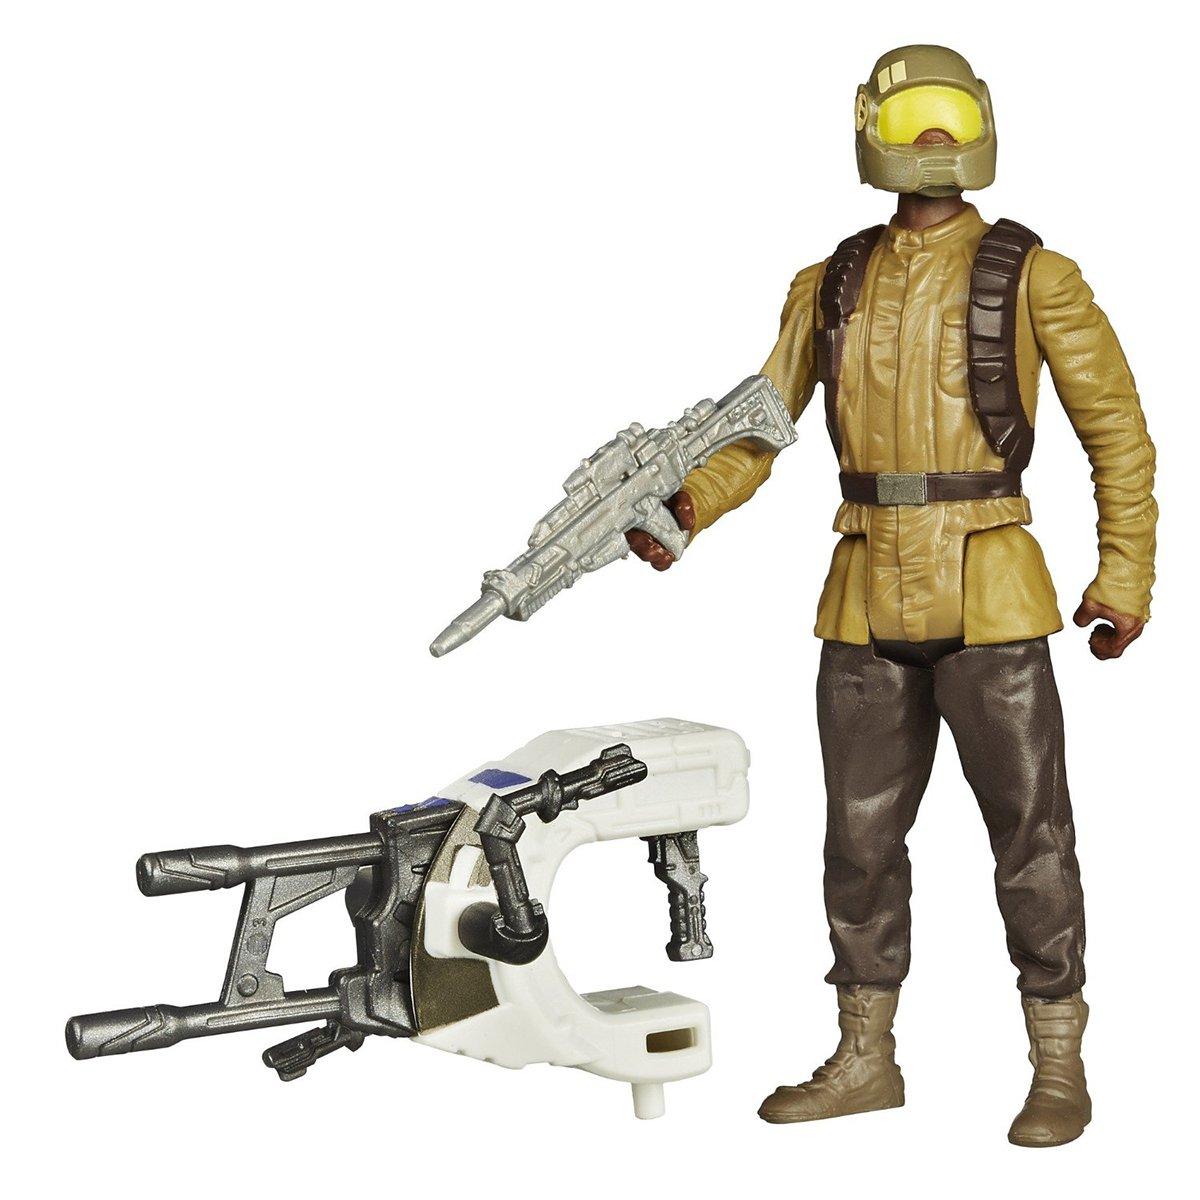 Set 2 figurine Star Wars The Force Awakens - Soldat al Rezistentei Space Mission, 9.5 cm